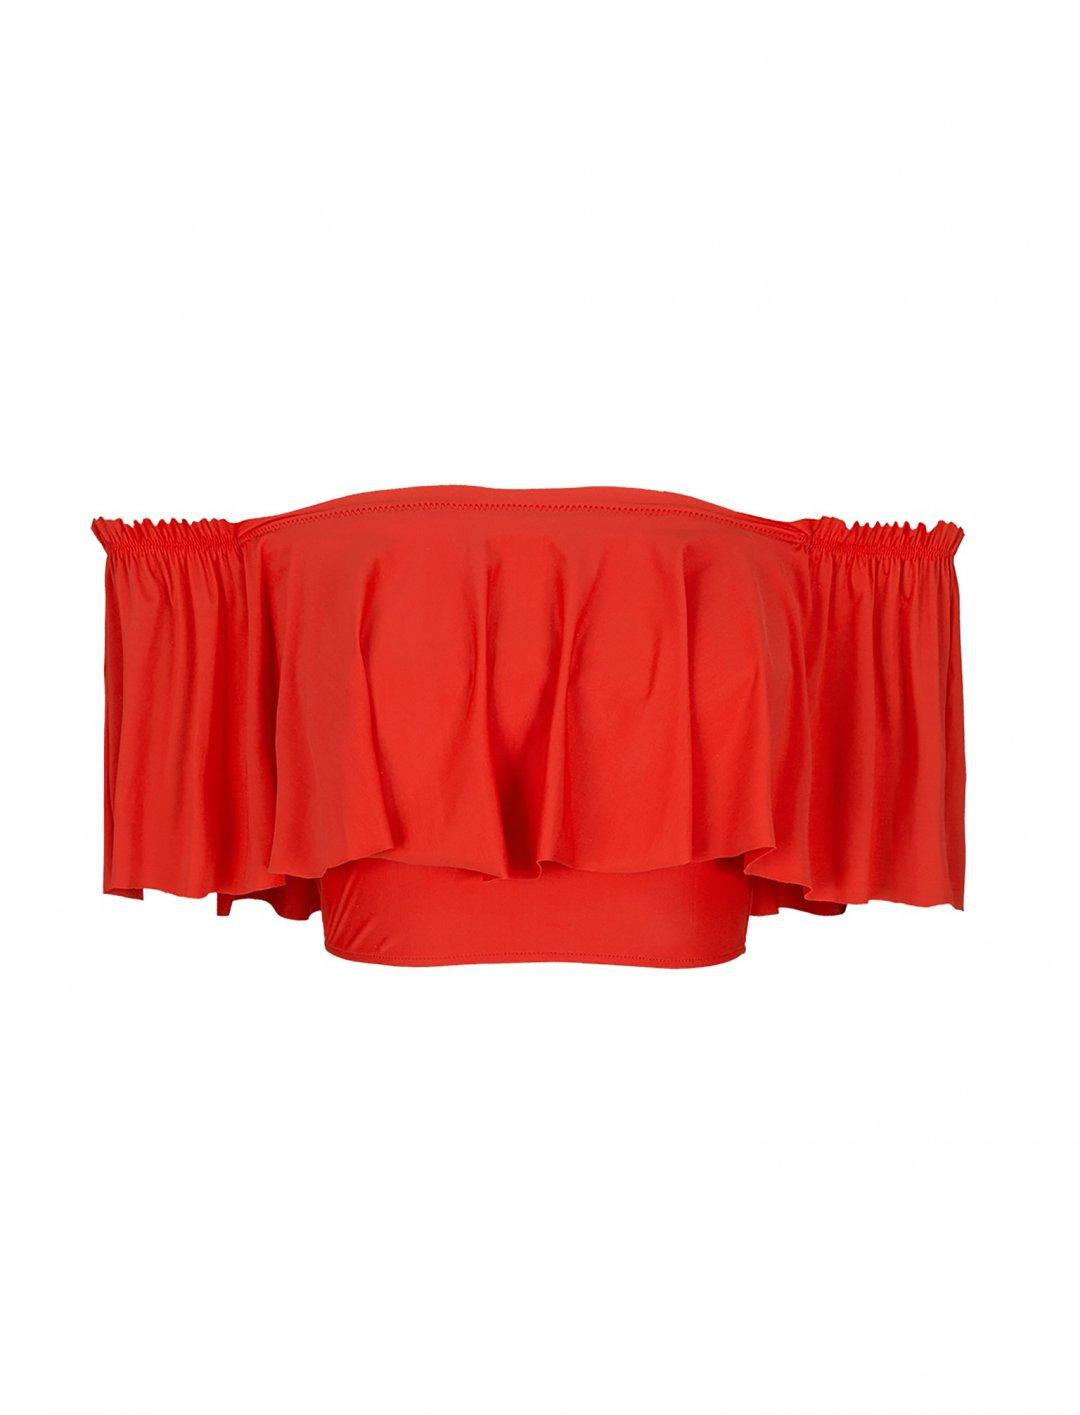 "Bandeau Bikini Top {""id"":5,""product_section_id"":1,""name"":""Clothing"",""order"":5} Rio De Sol"